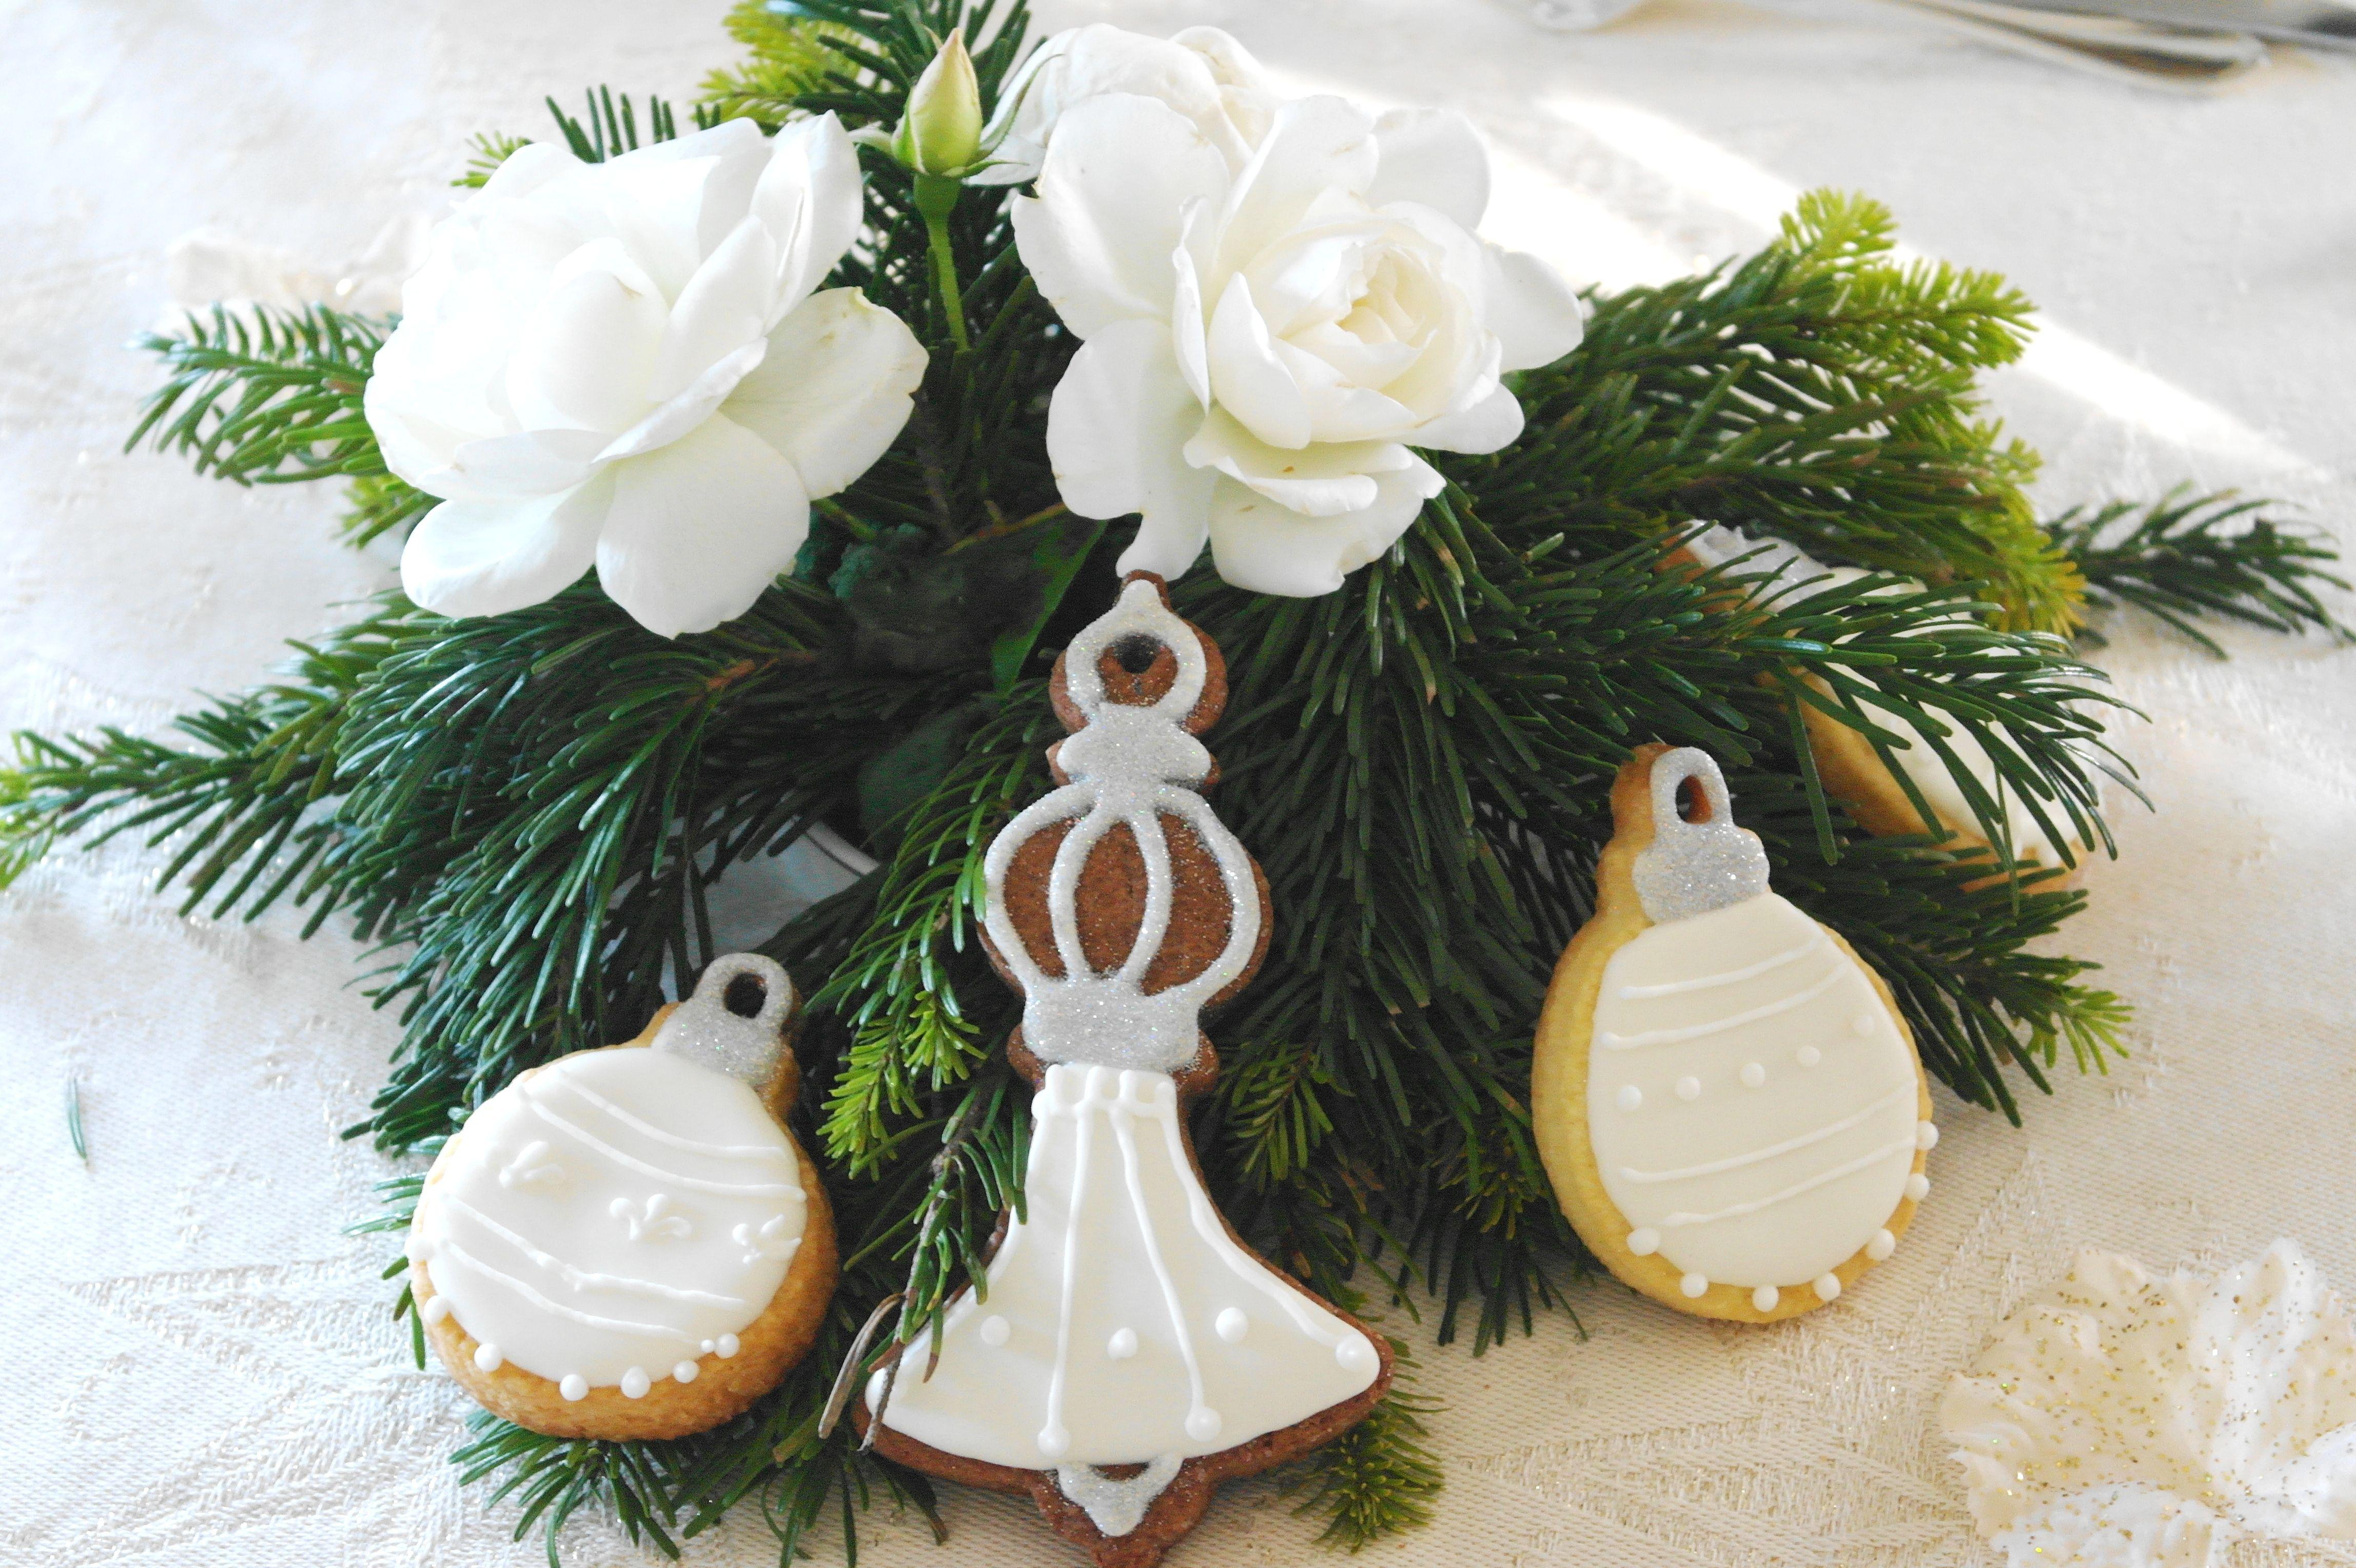 Biscotti natalizi centrotavola e segnaposto segnaposti pinterest segnaposto centrotavola - Centrotavola natalizi pinterest ...